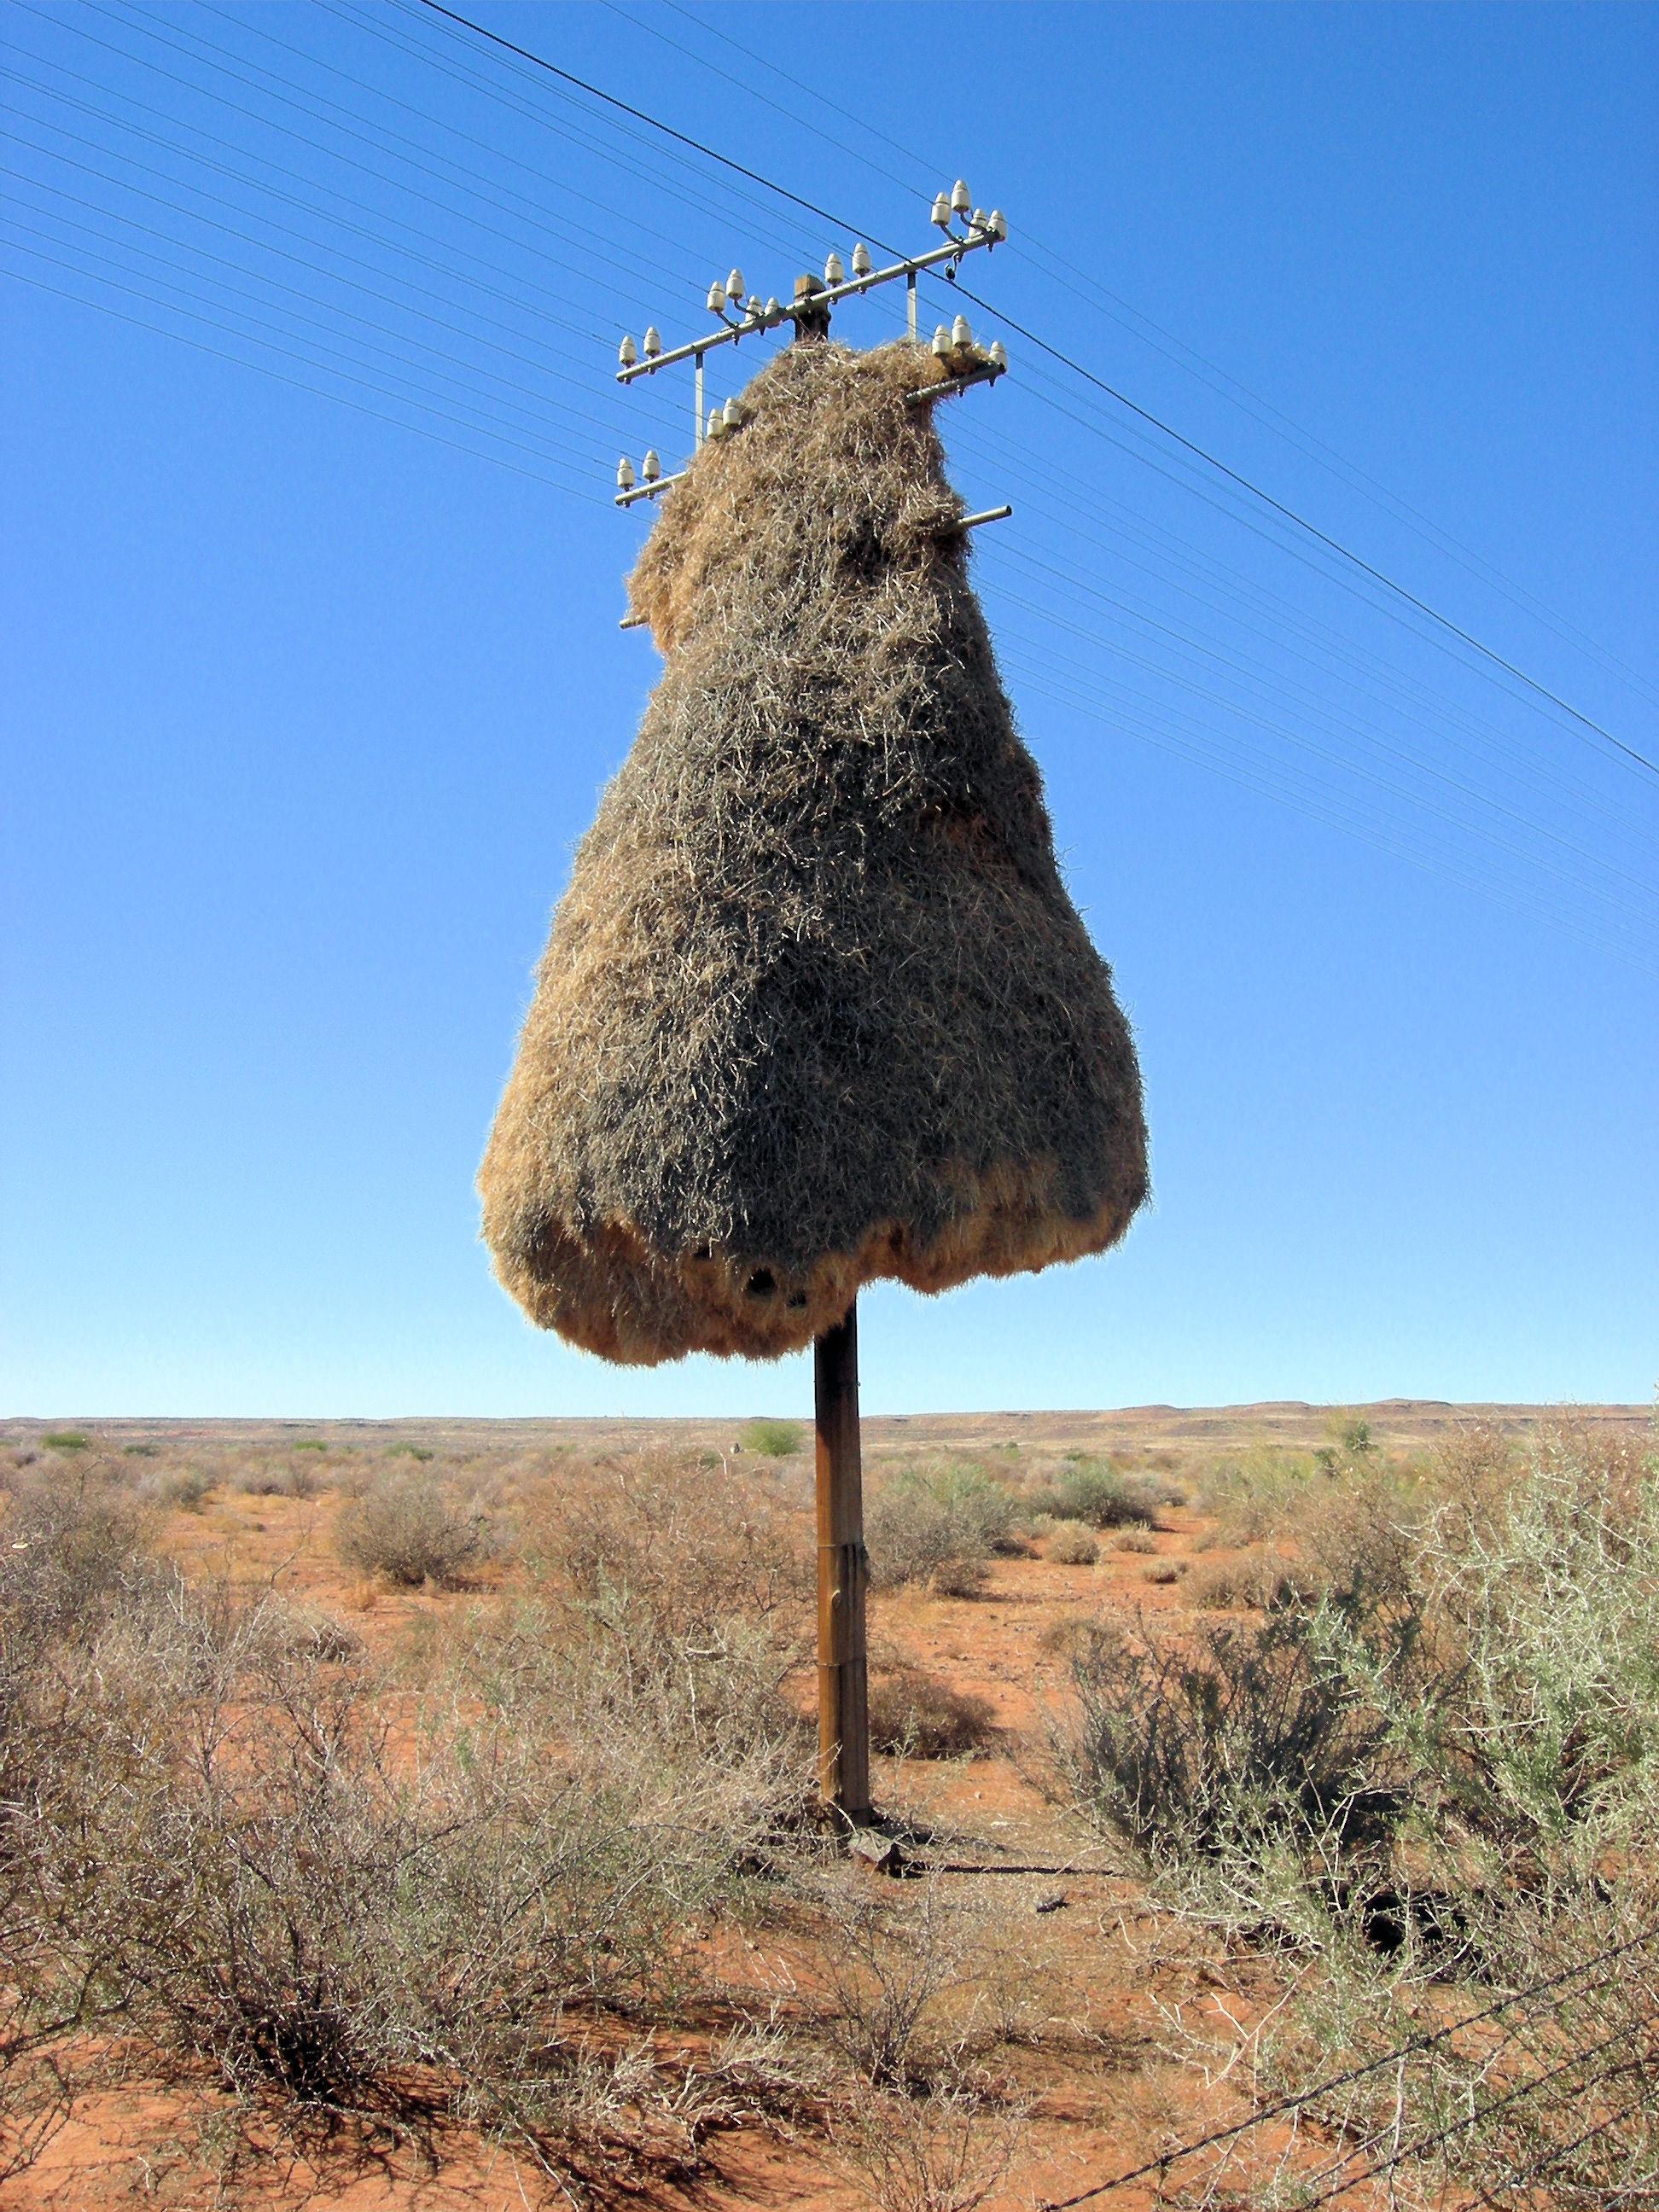 Weaver bird nest pictures - photo#18